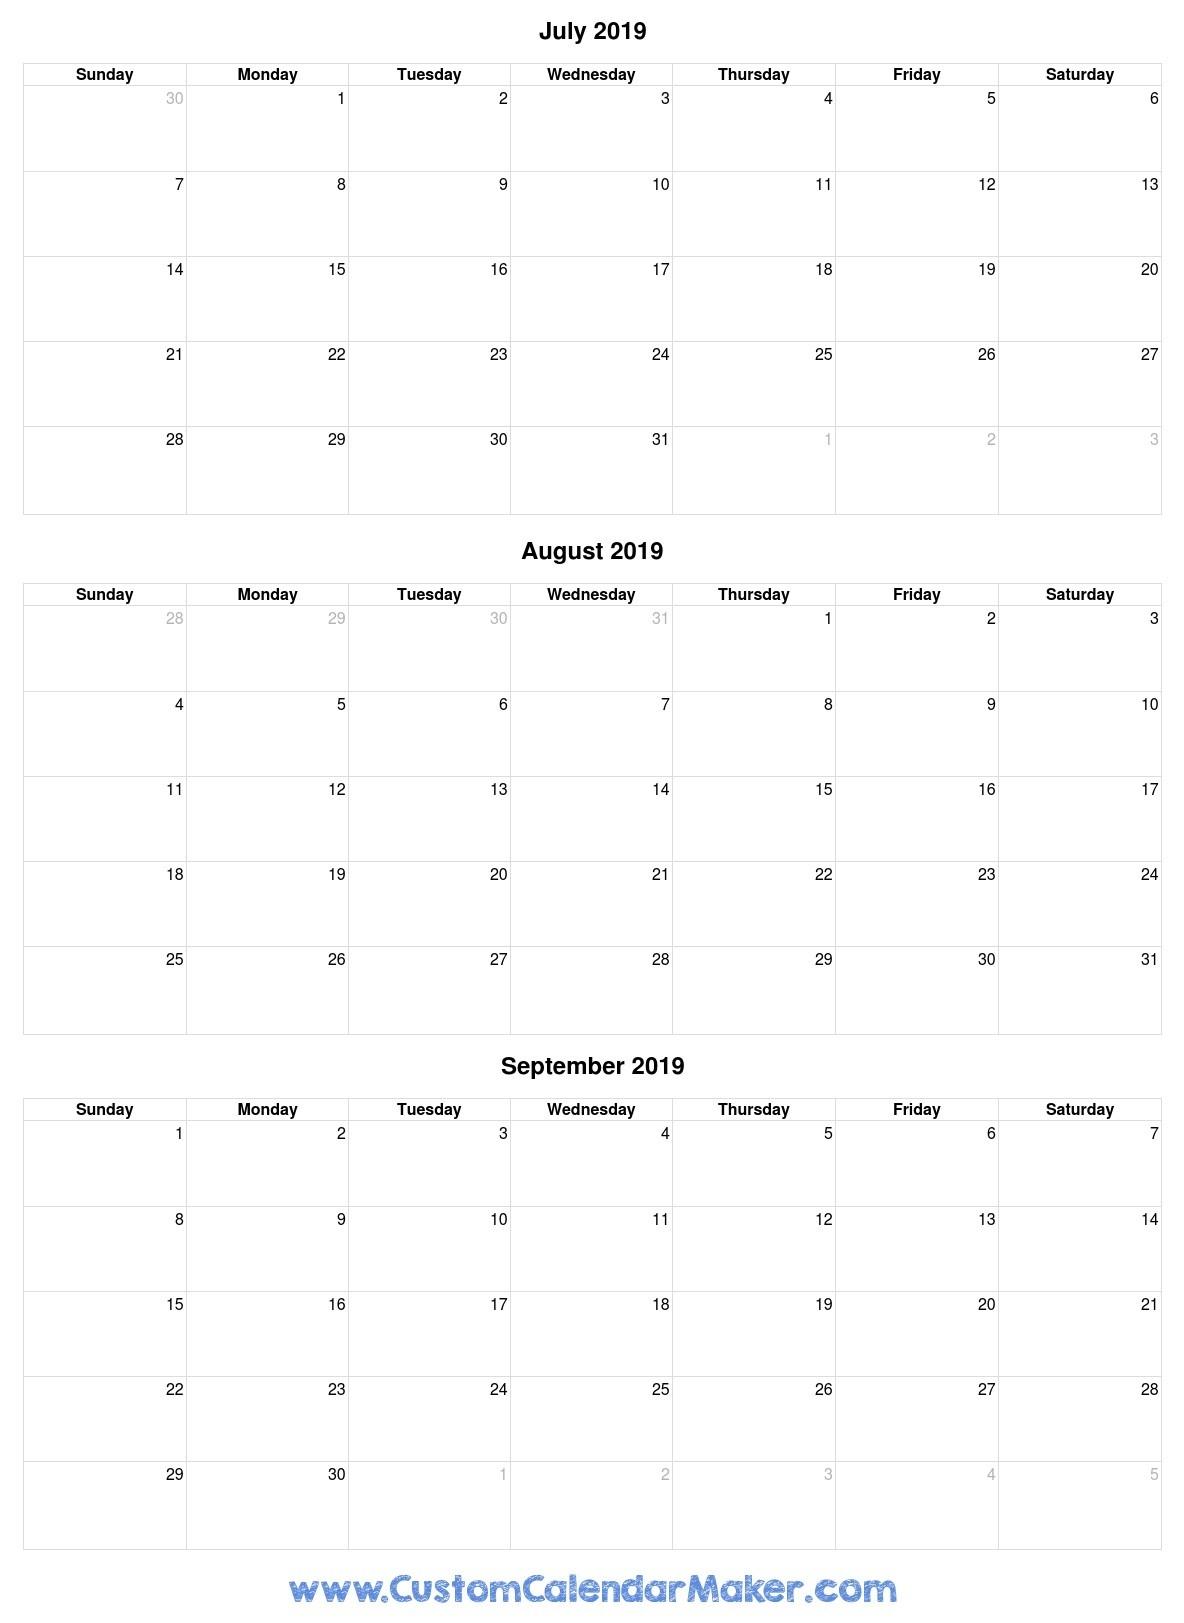 July To September 2019 Calendar - Free Printable Template-Blank Callendar For June July Aug And Sept